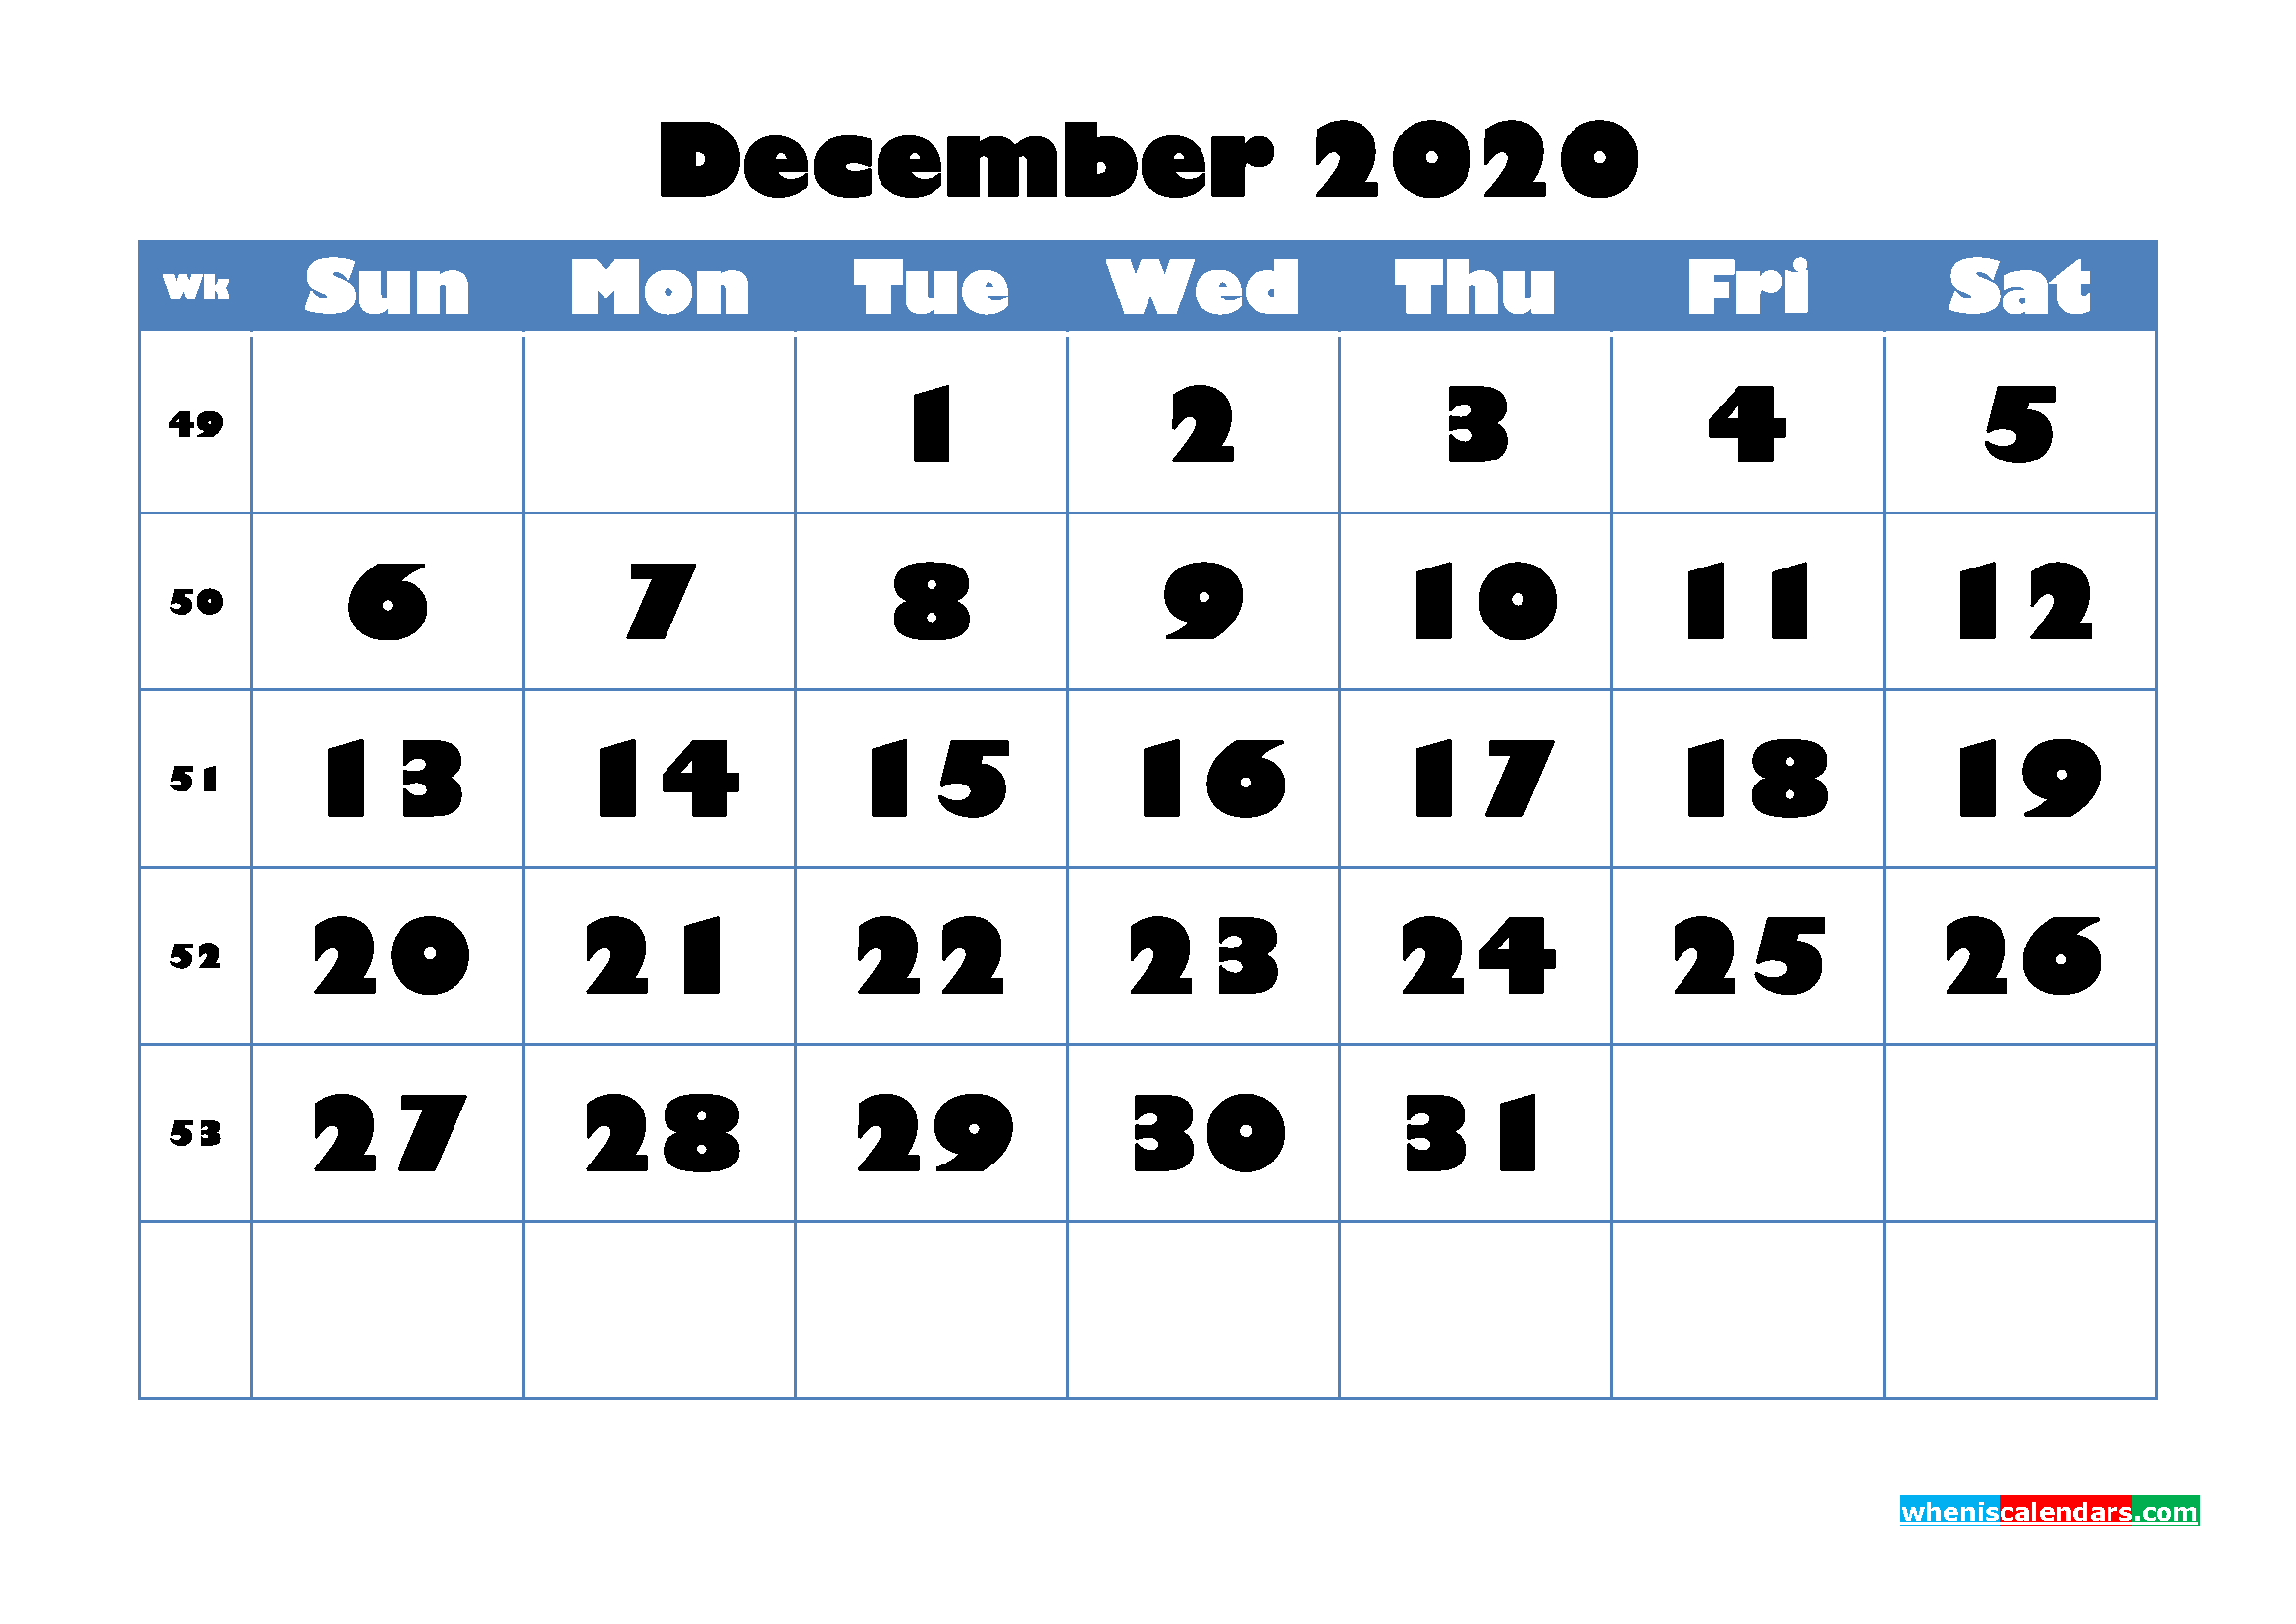 December 2020 Blank Calendar Printable - No.m20b720